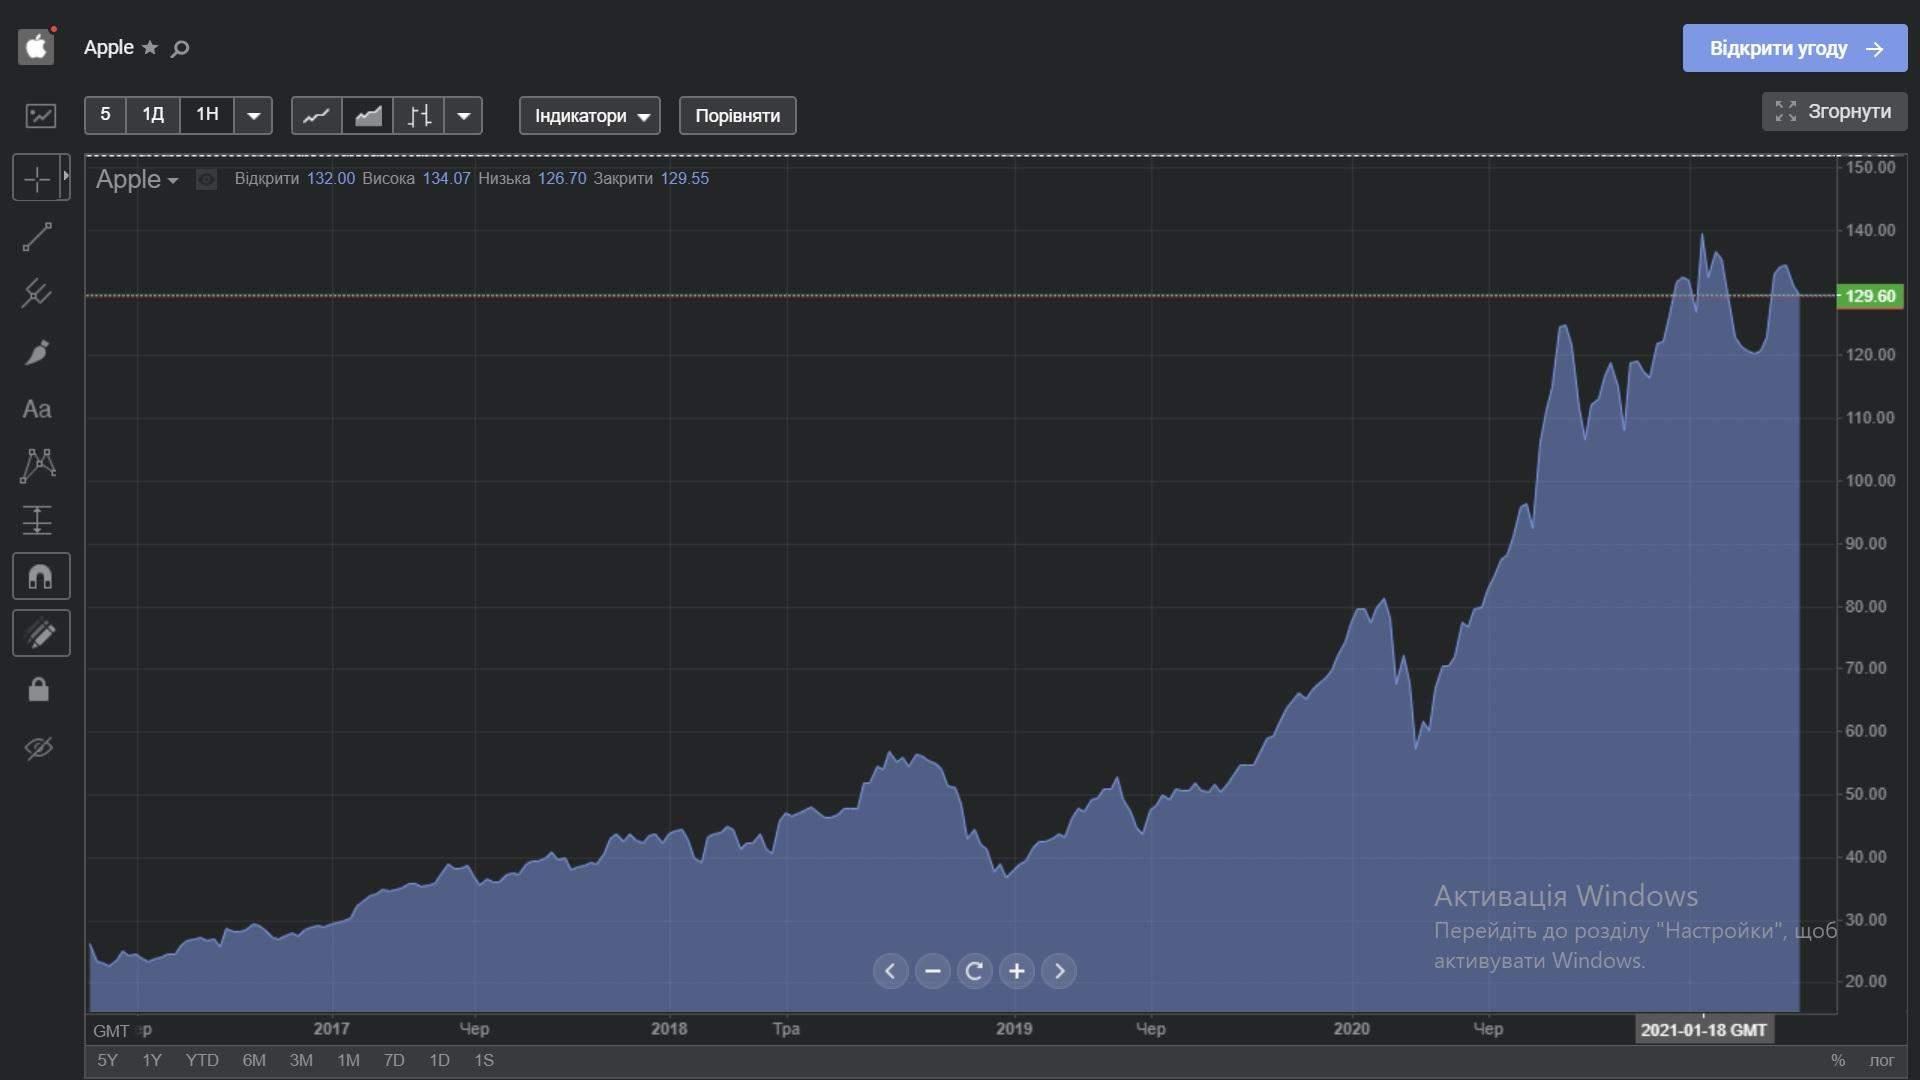 Акции Apple с 2016 года